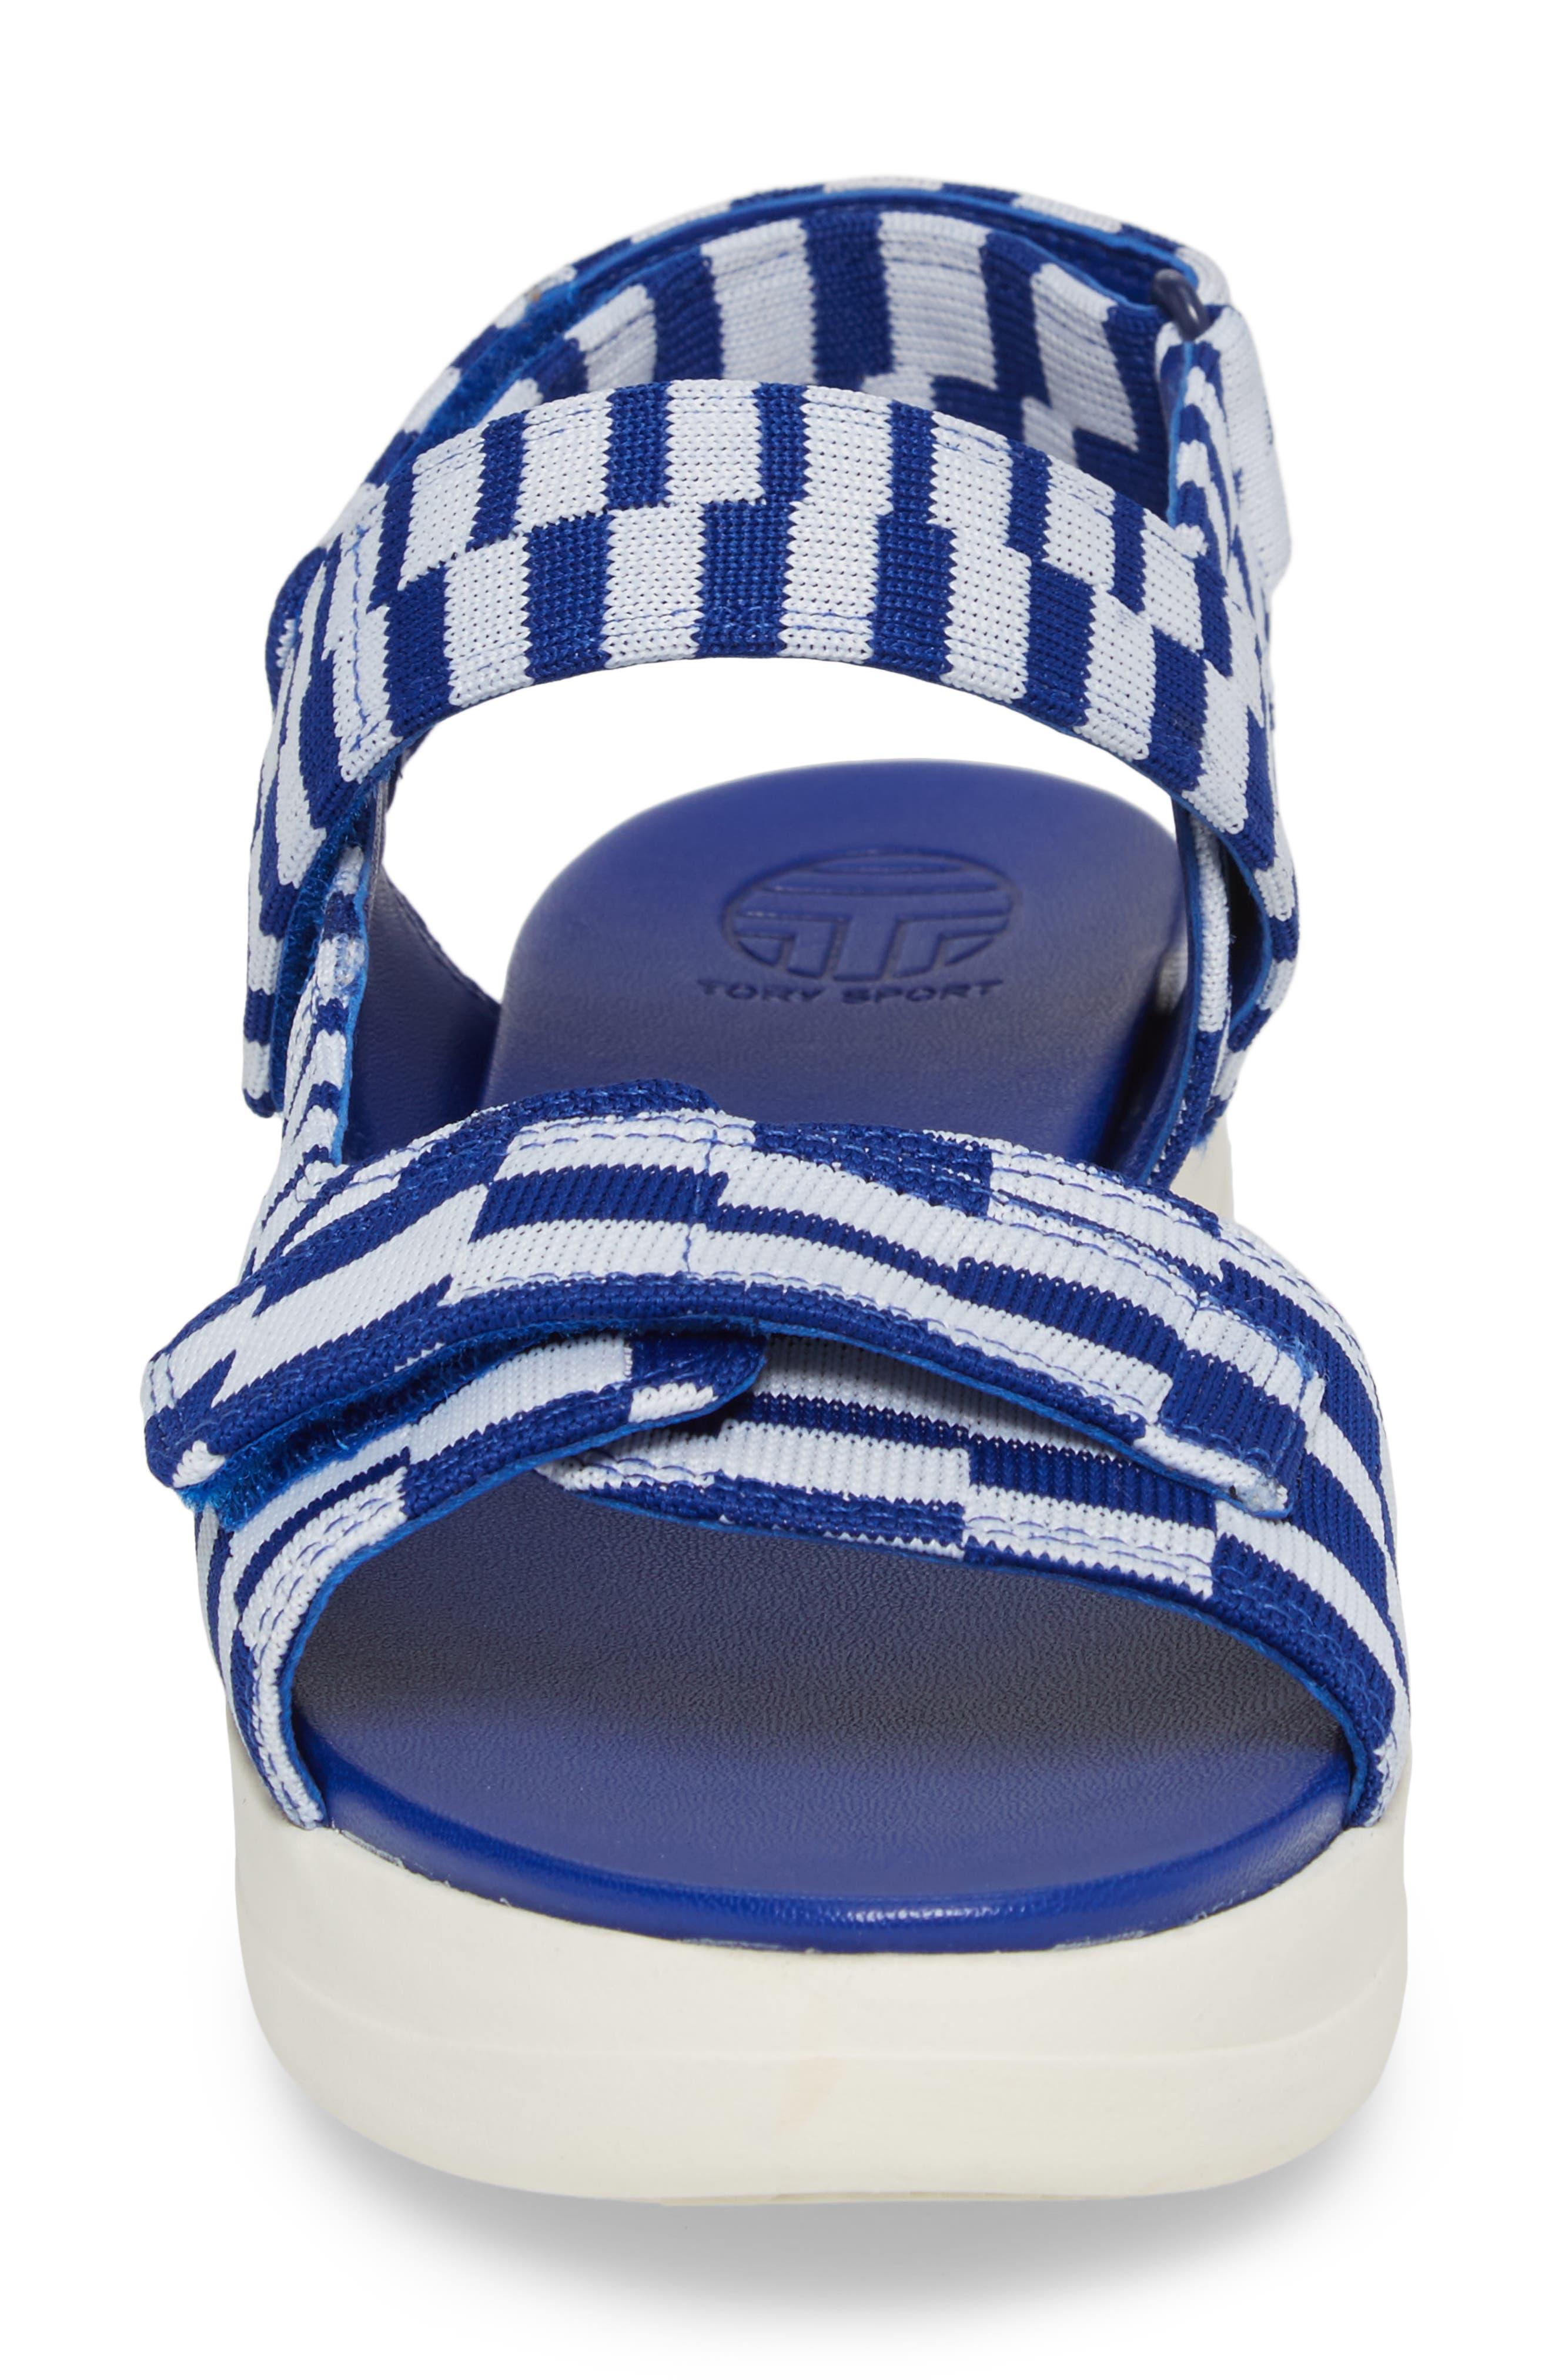 Flatform Sandal,                             Alternate thumbnail 4, color,                             Check Slalom Blue